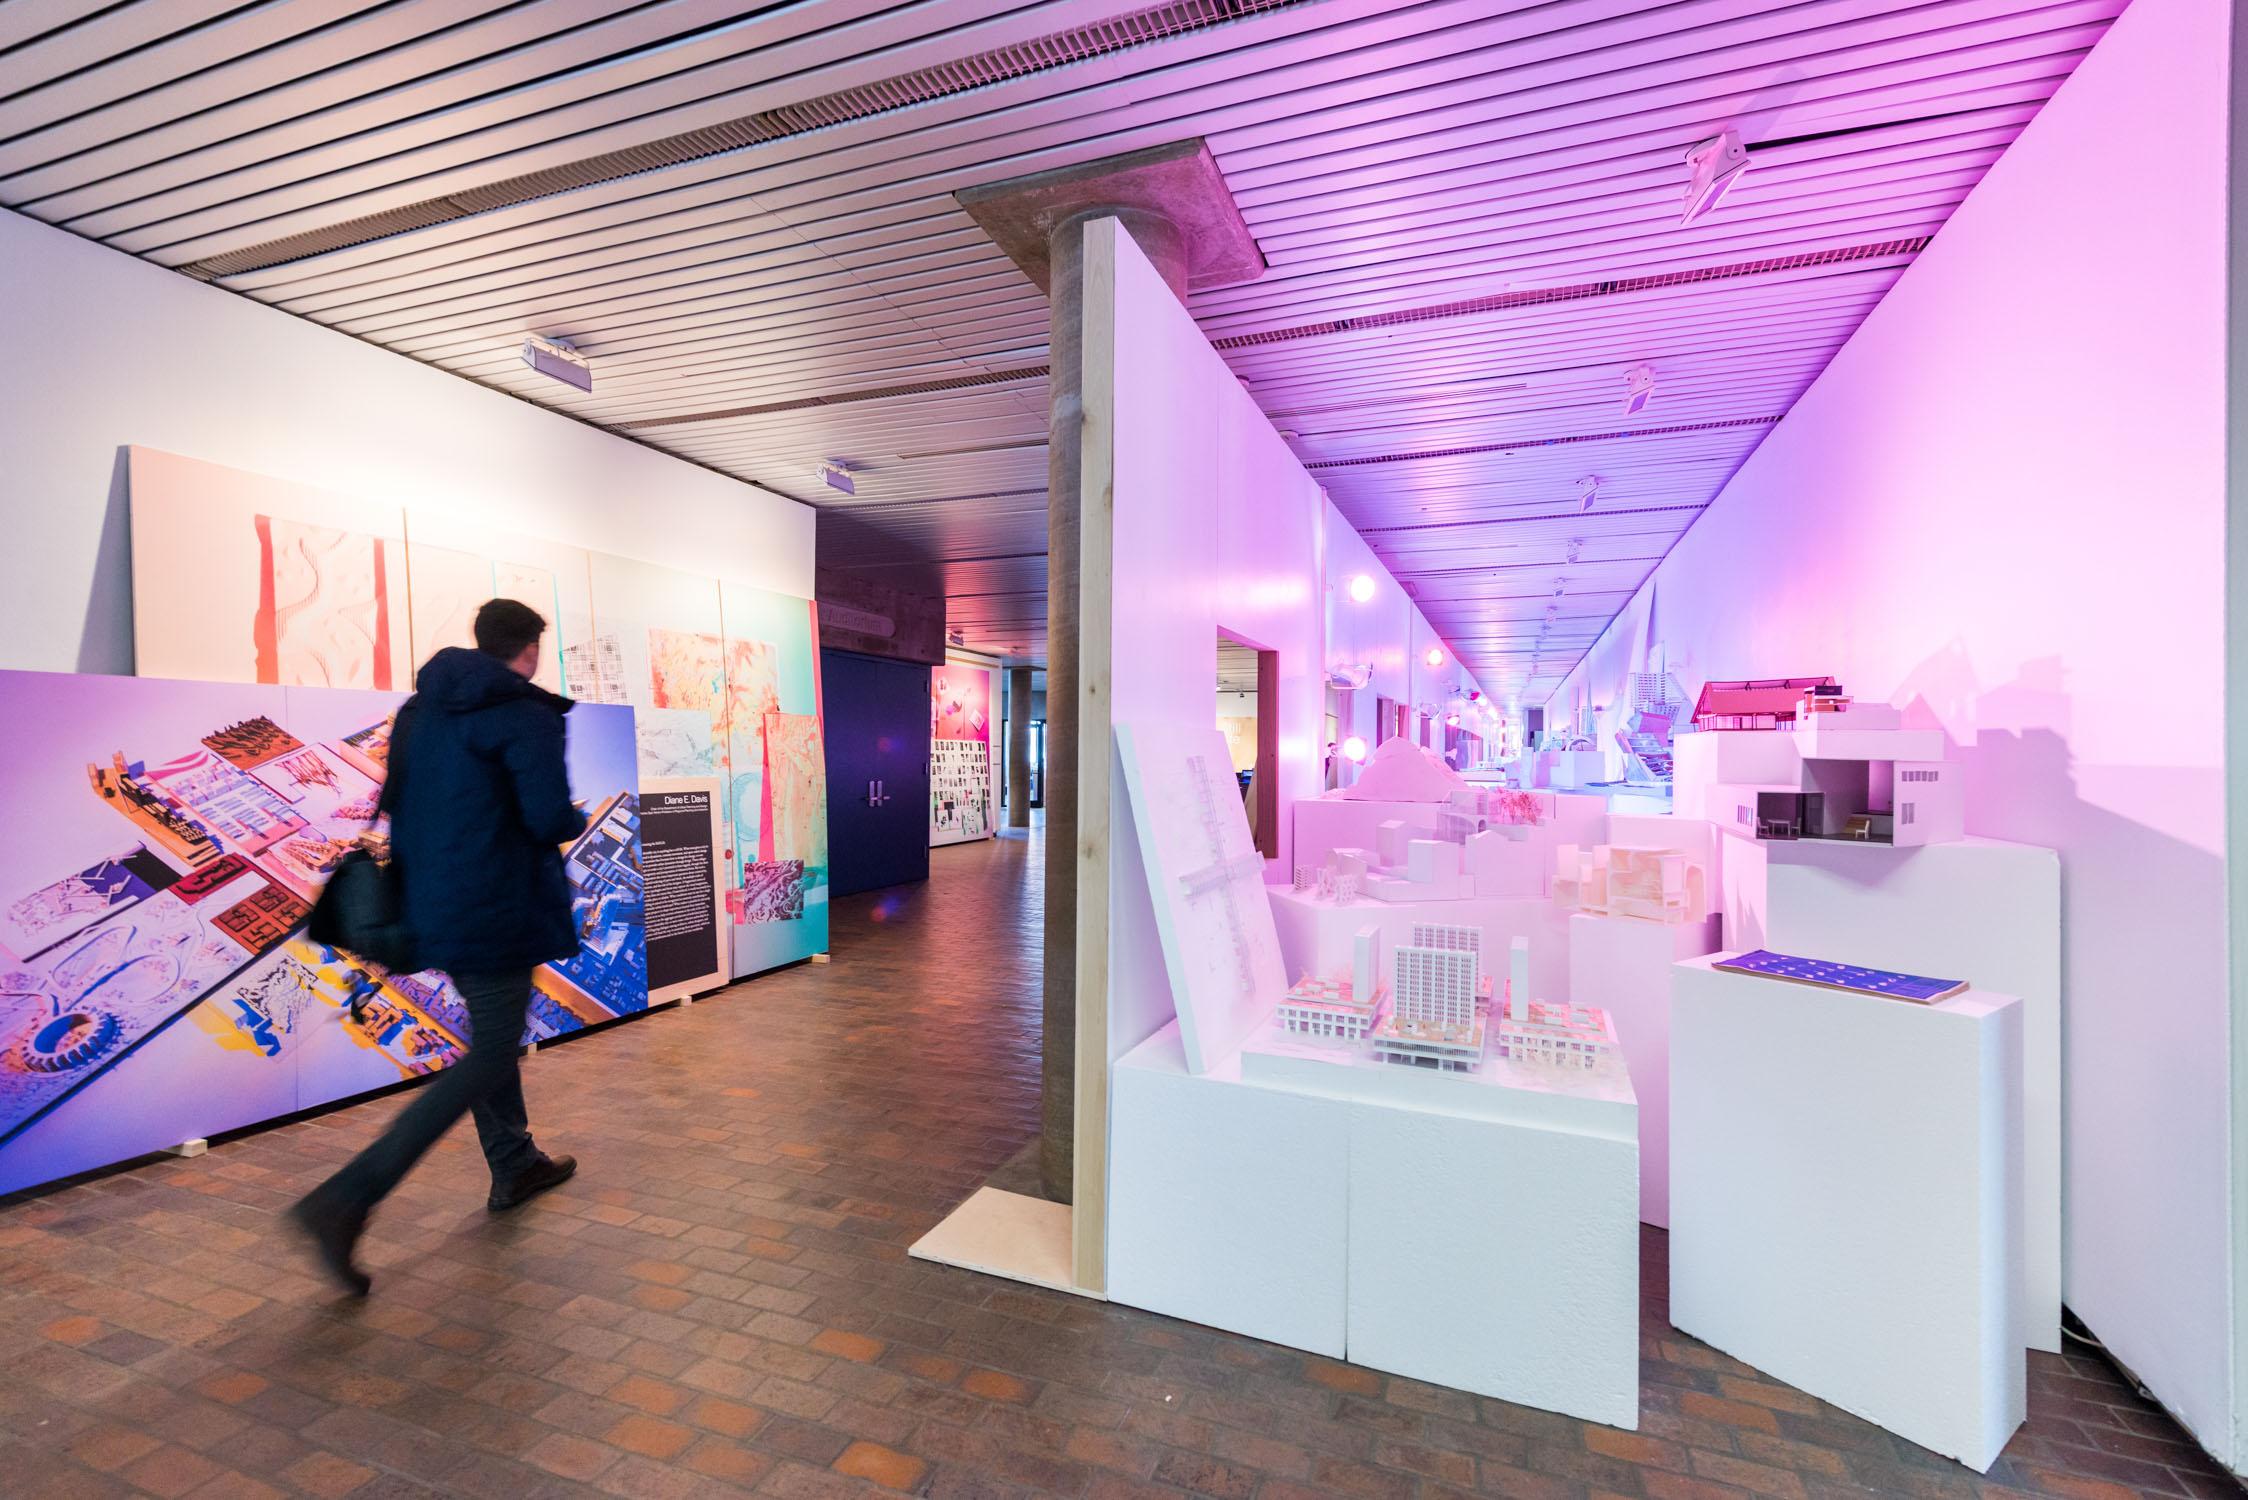 Stil Life - Platform 9 Exhibit